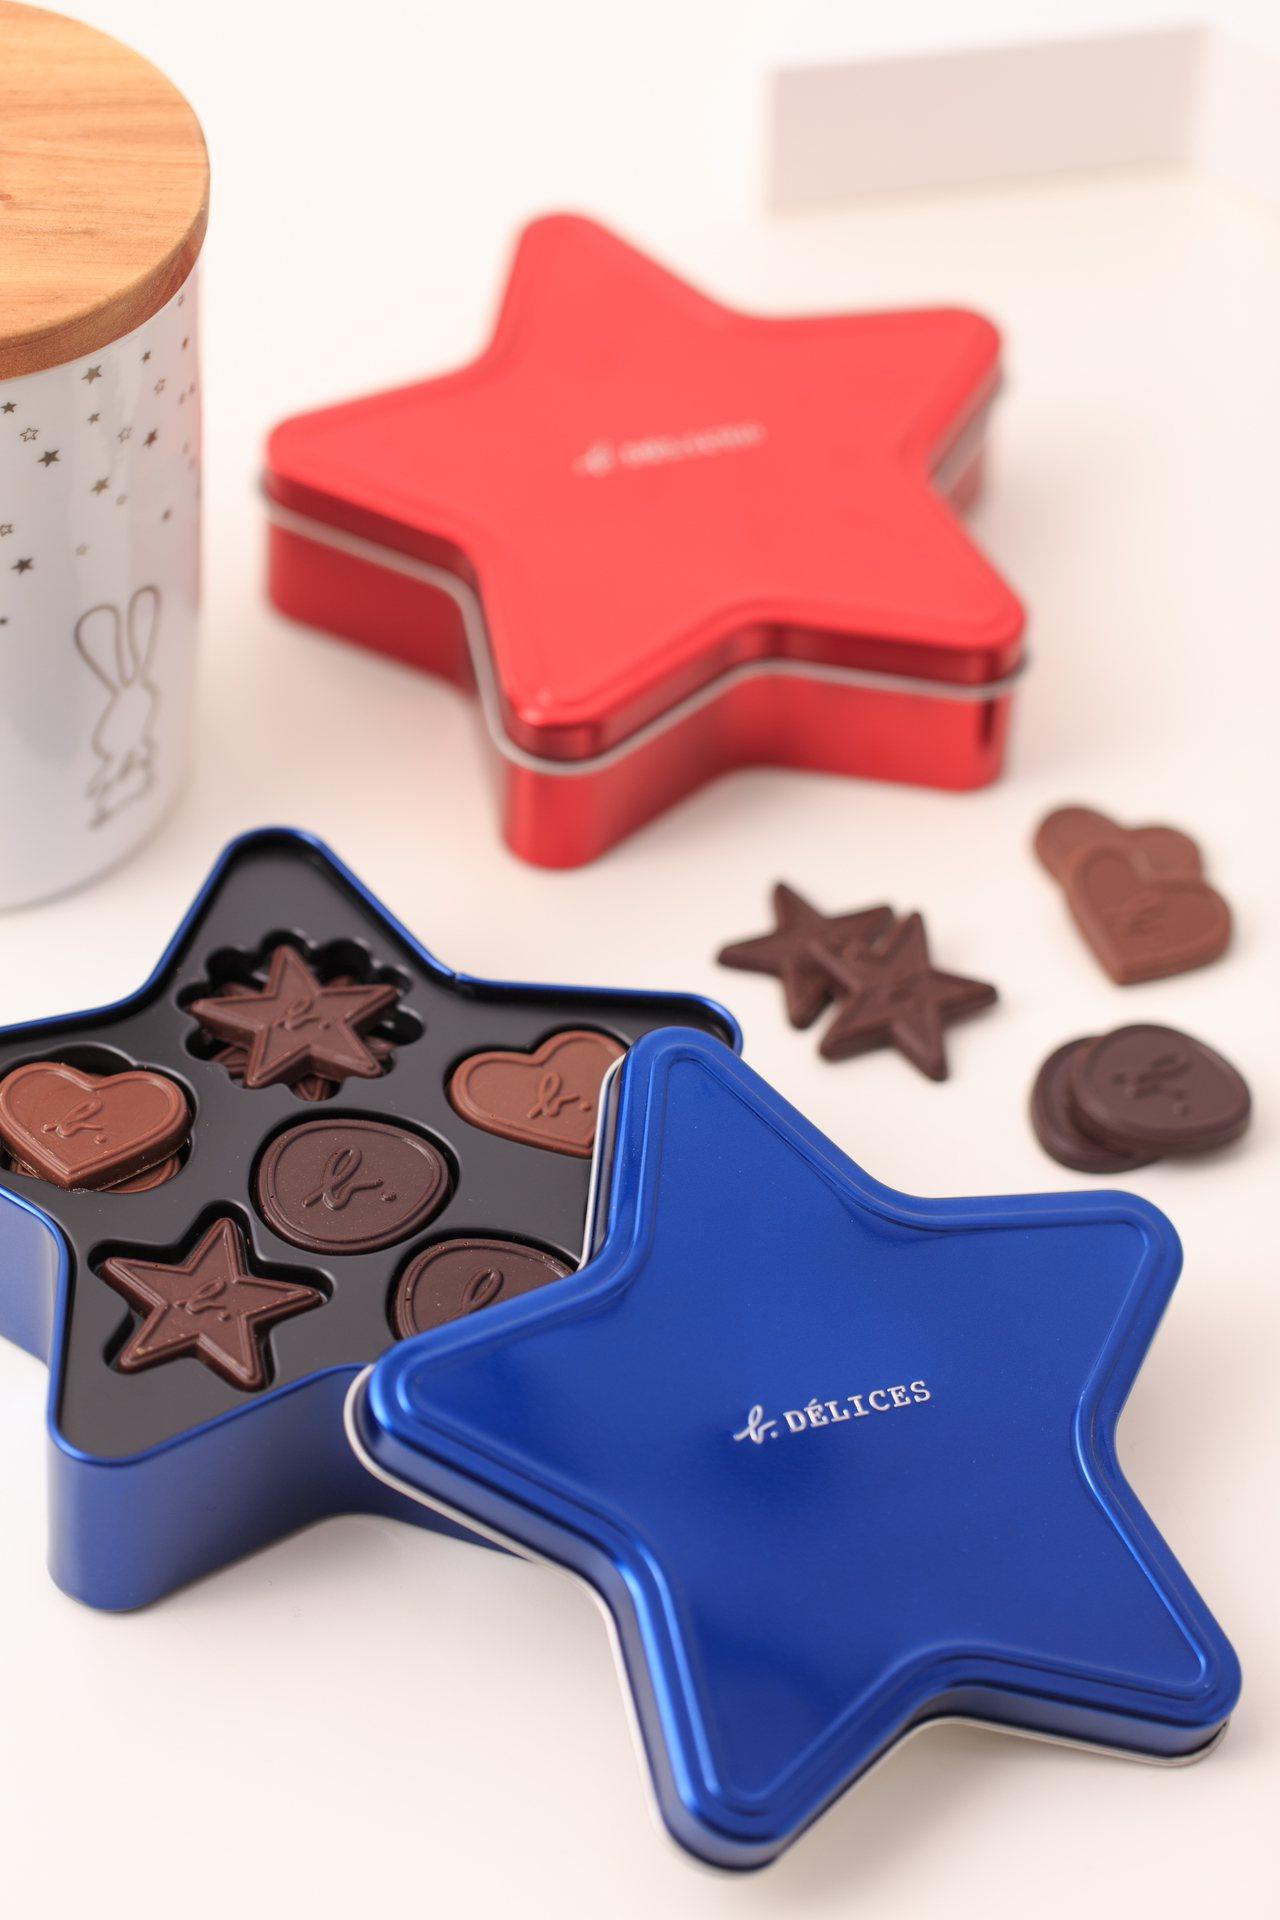 b. DÉLICES 星星片裝巧克力禮盒,880元。圖/ agnès b.提供